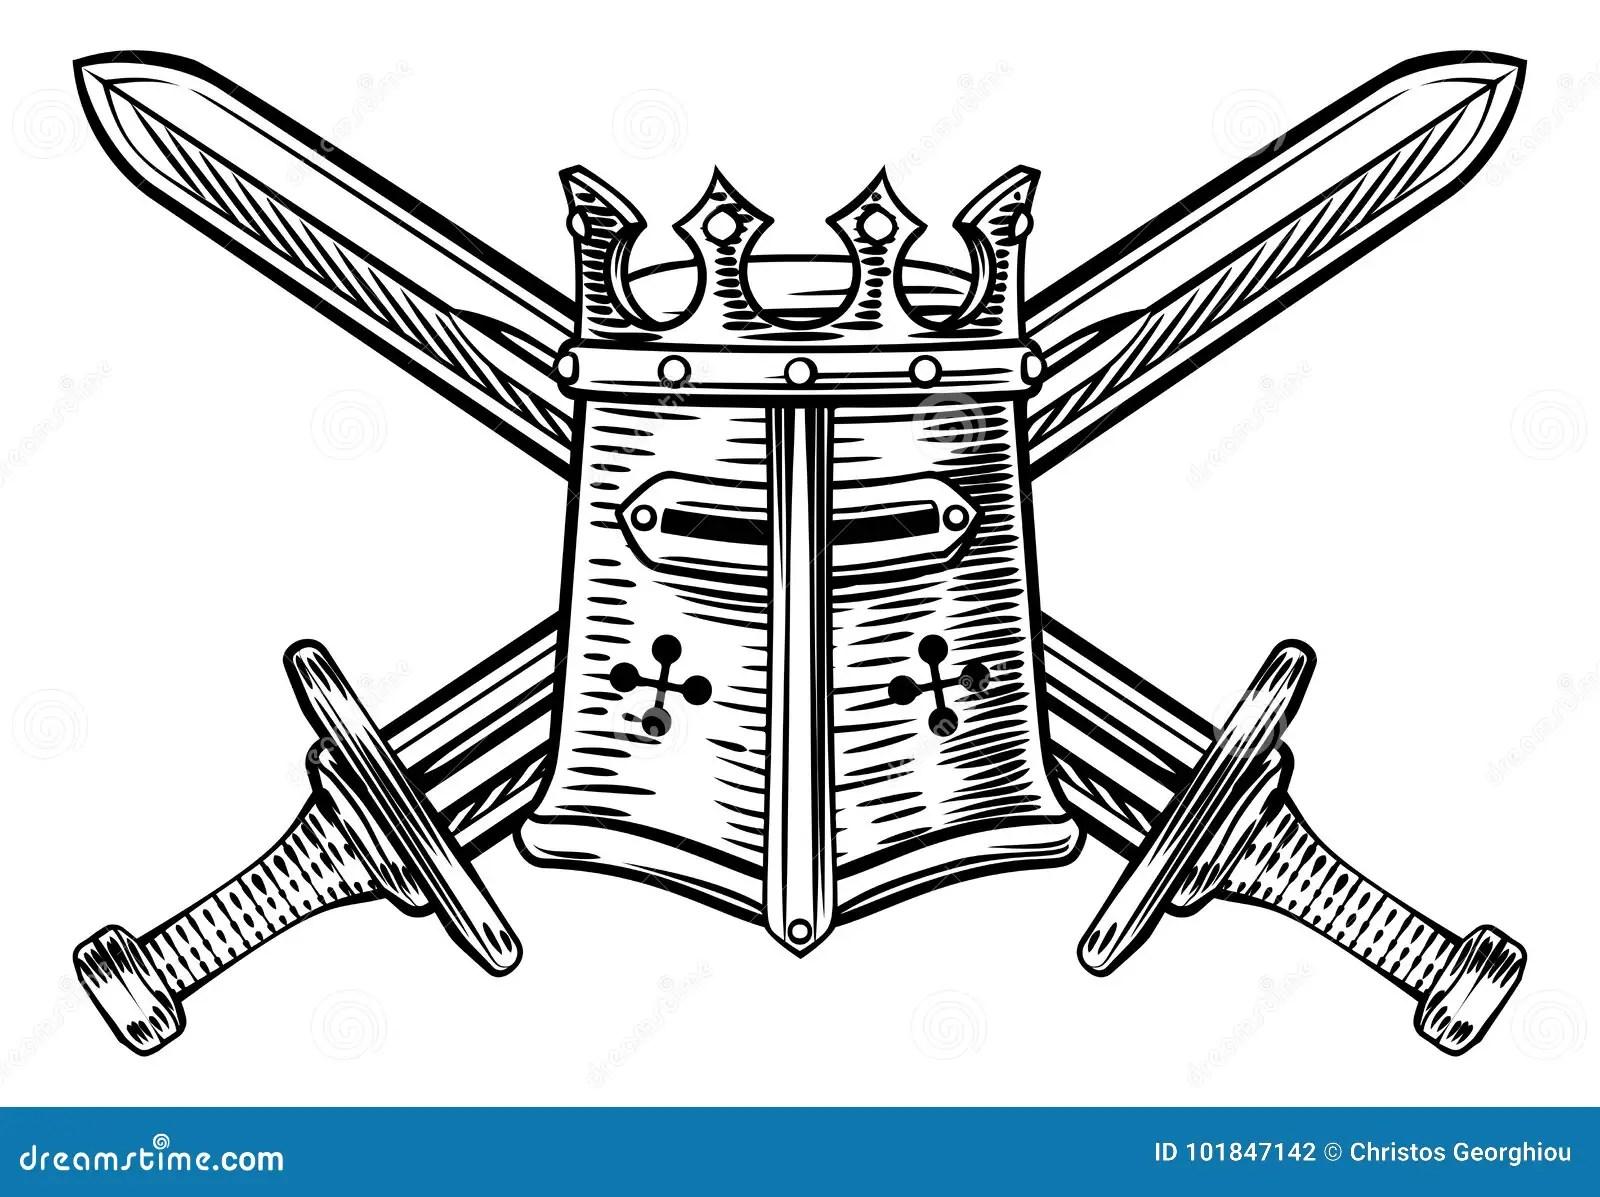 Knight Helmet And Crossed Swords Illustration Stock Vector